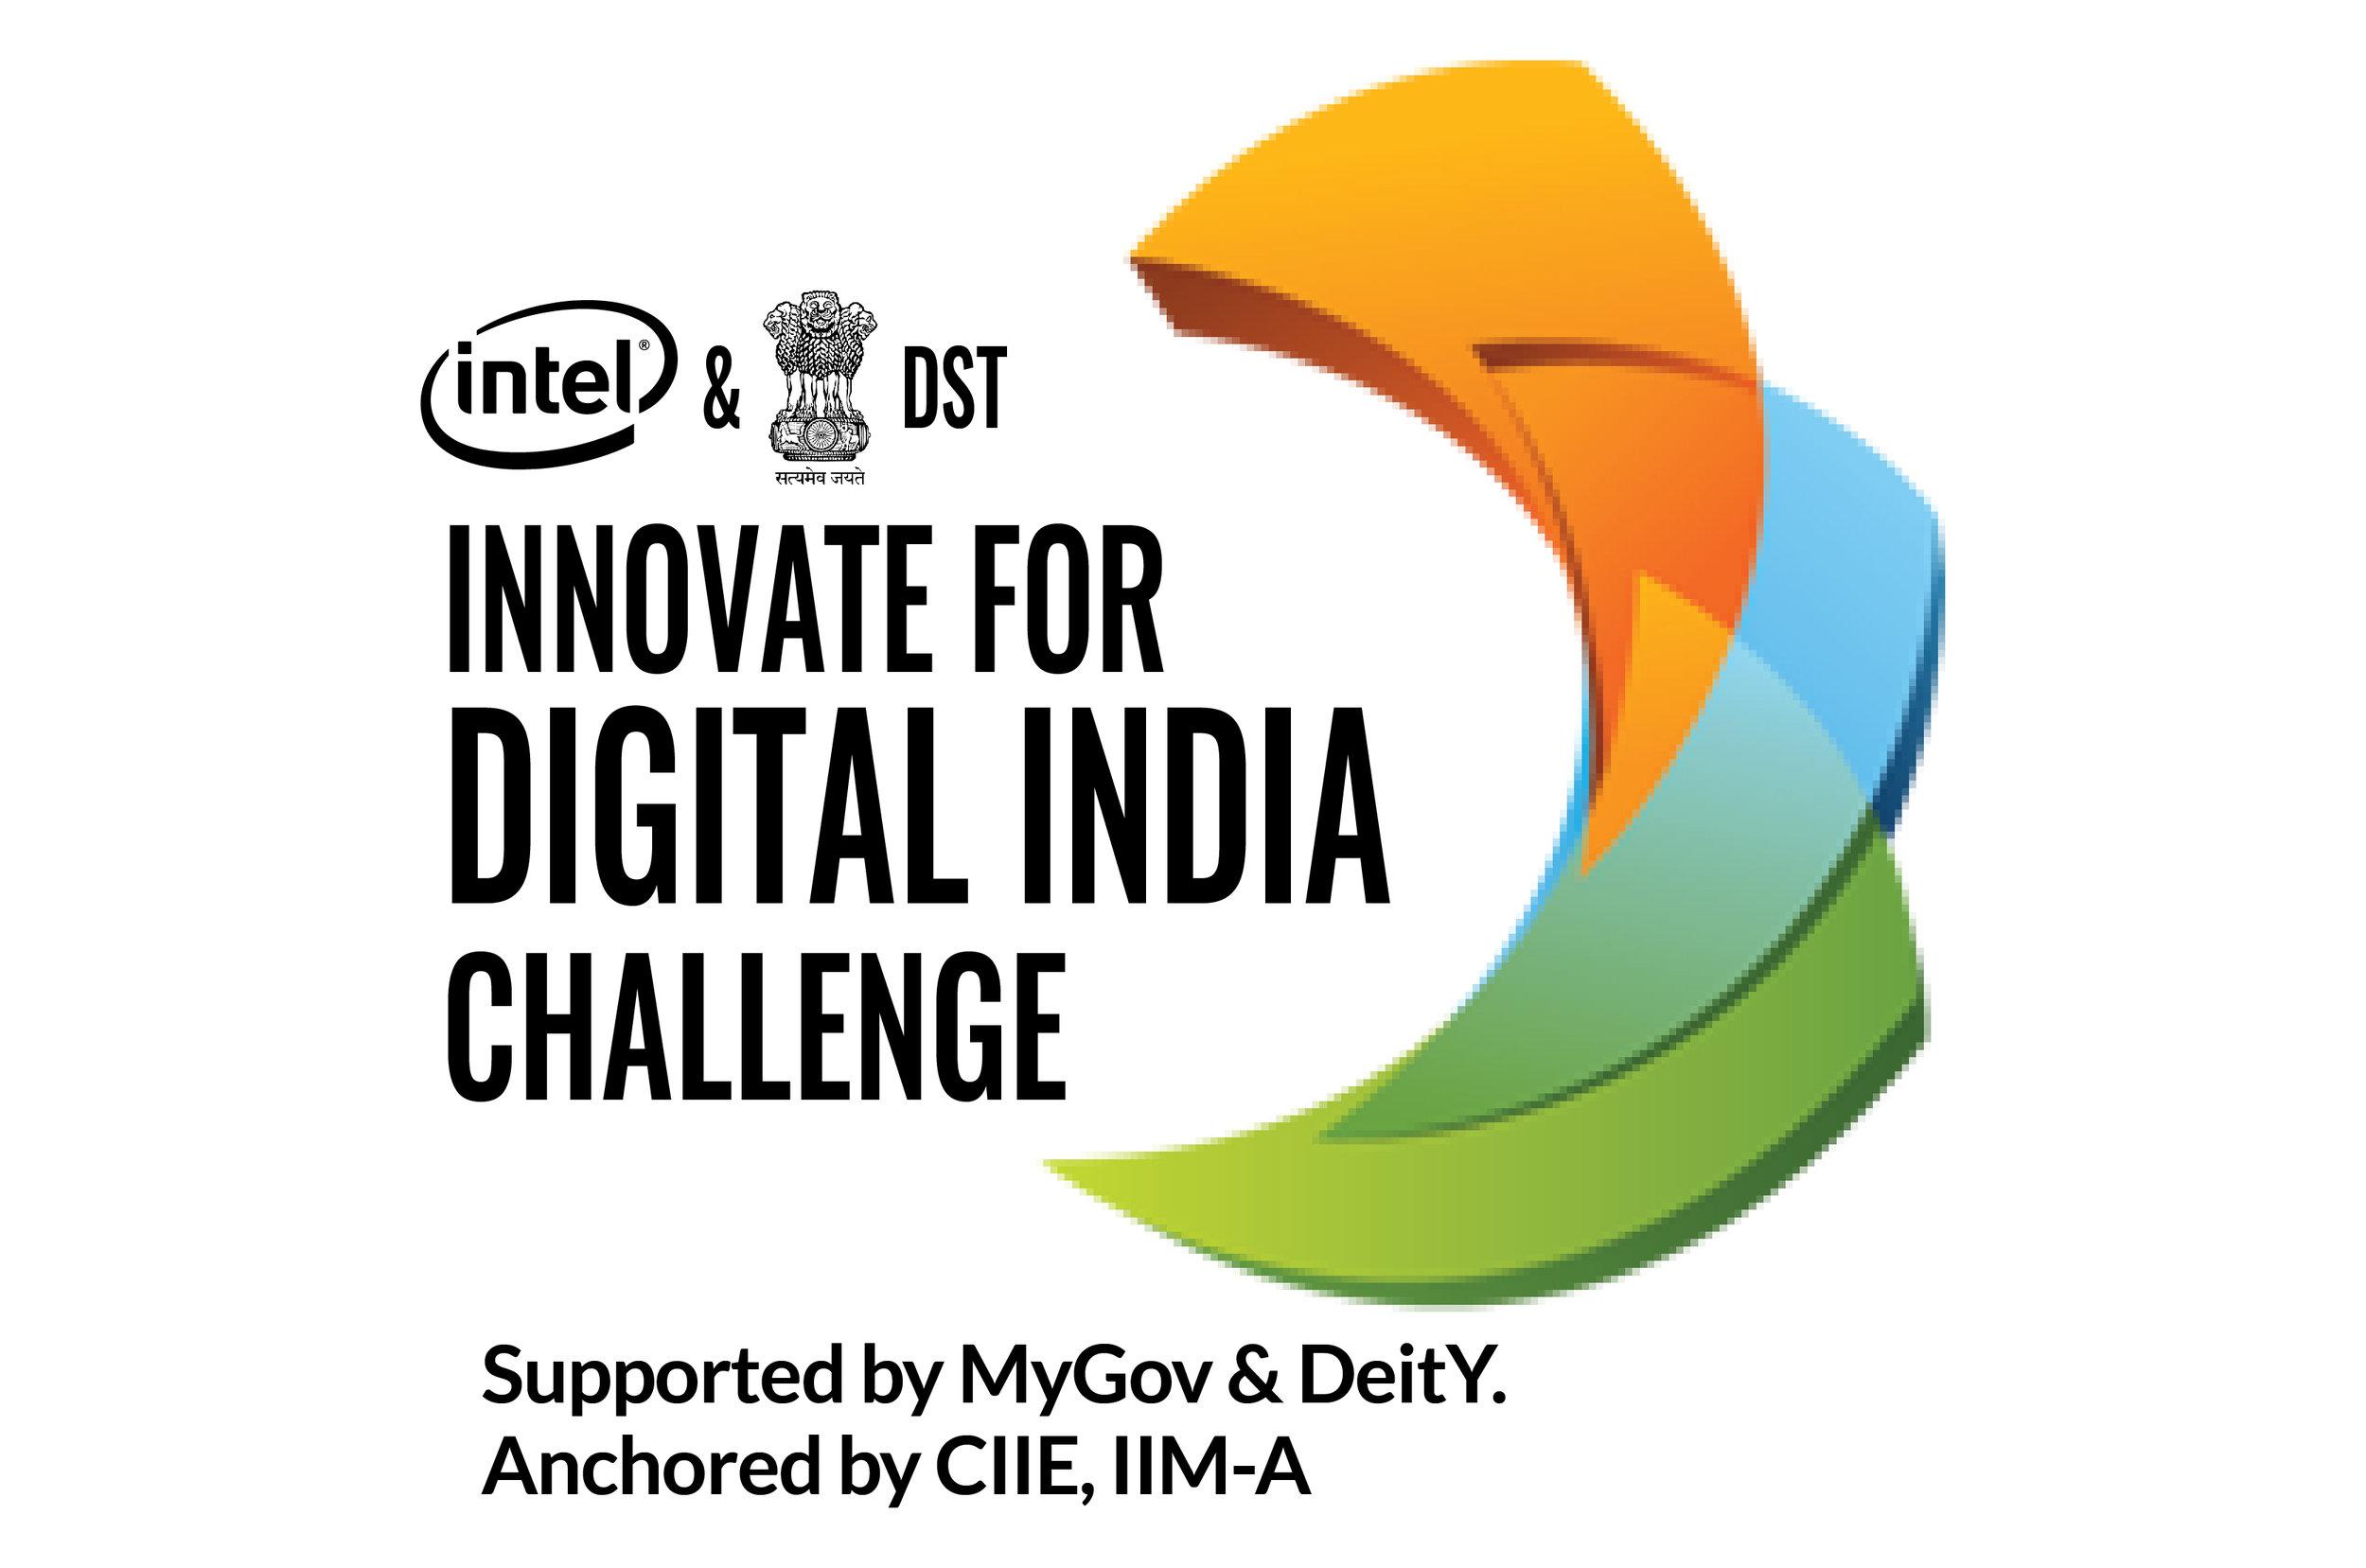 INTEL Digital Innovation Programme 2016_Elephant Design_Pune, Singapore.jpg